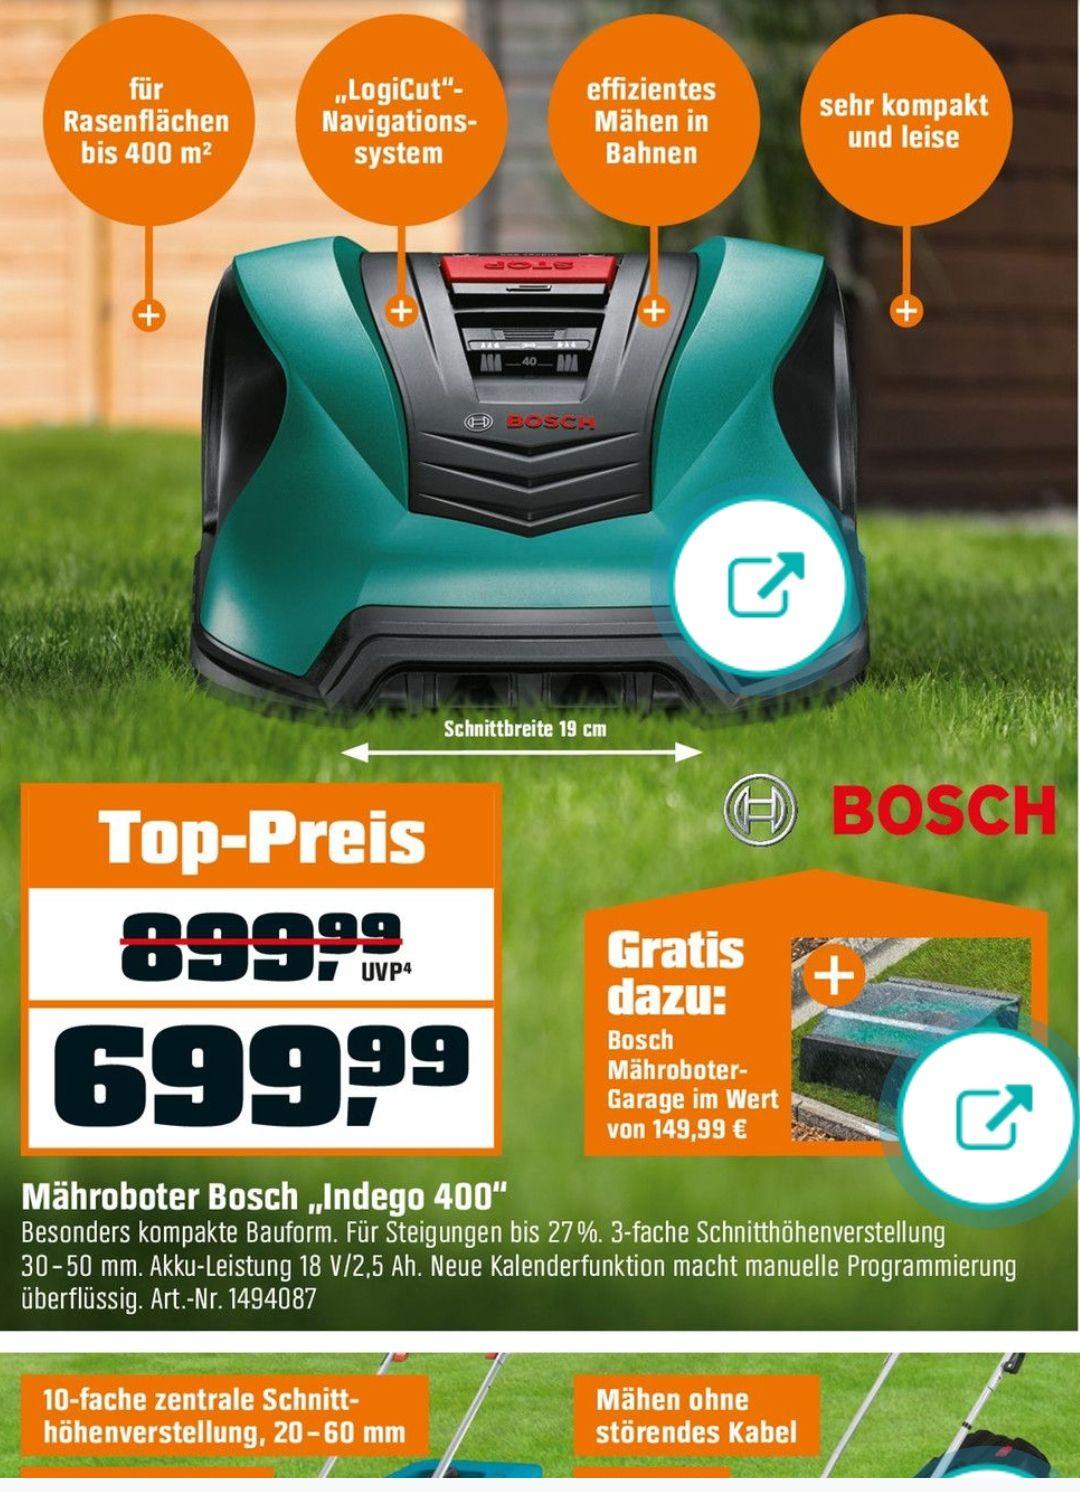 Bosch Mähroboter Indego 400 inkl. Mähroboter-Garage